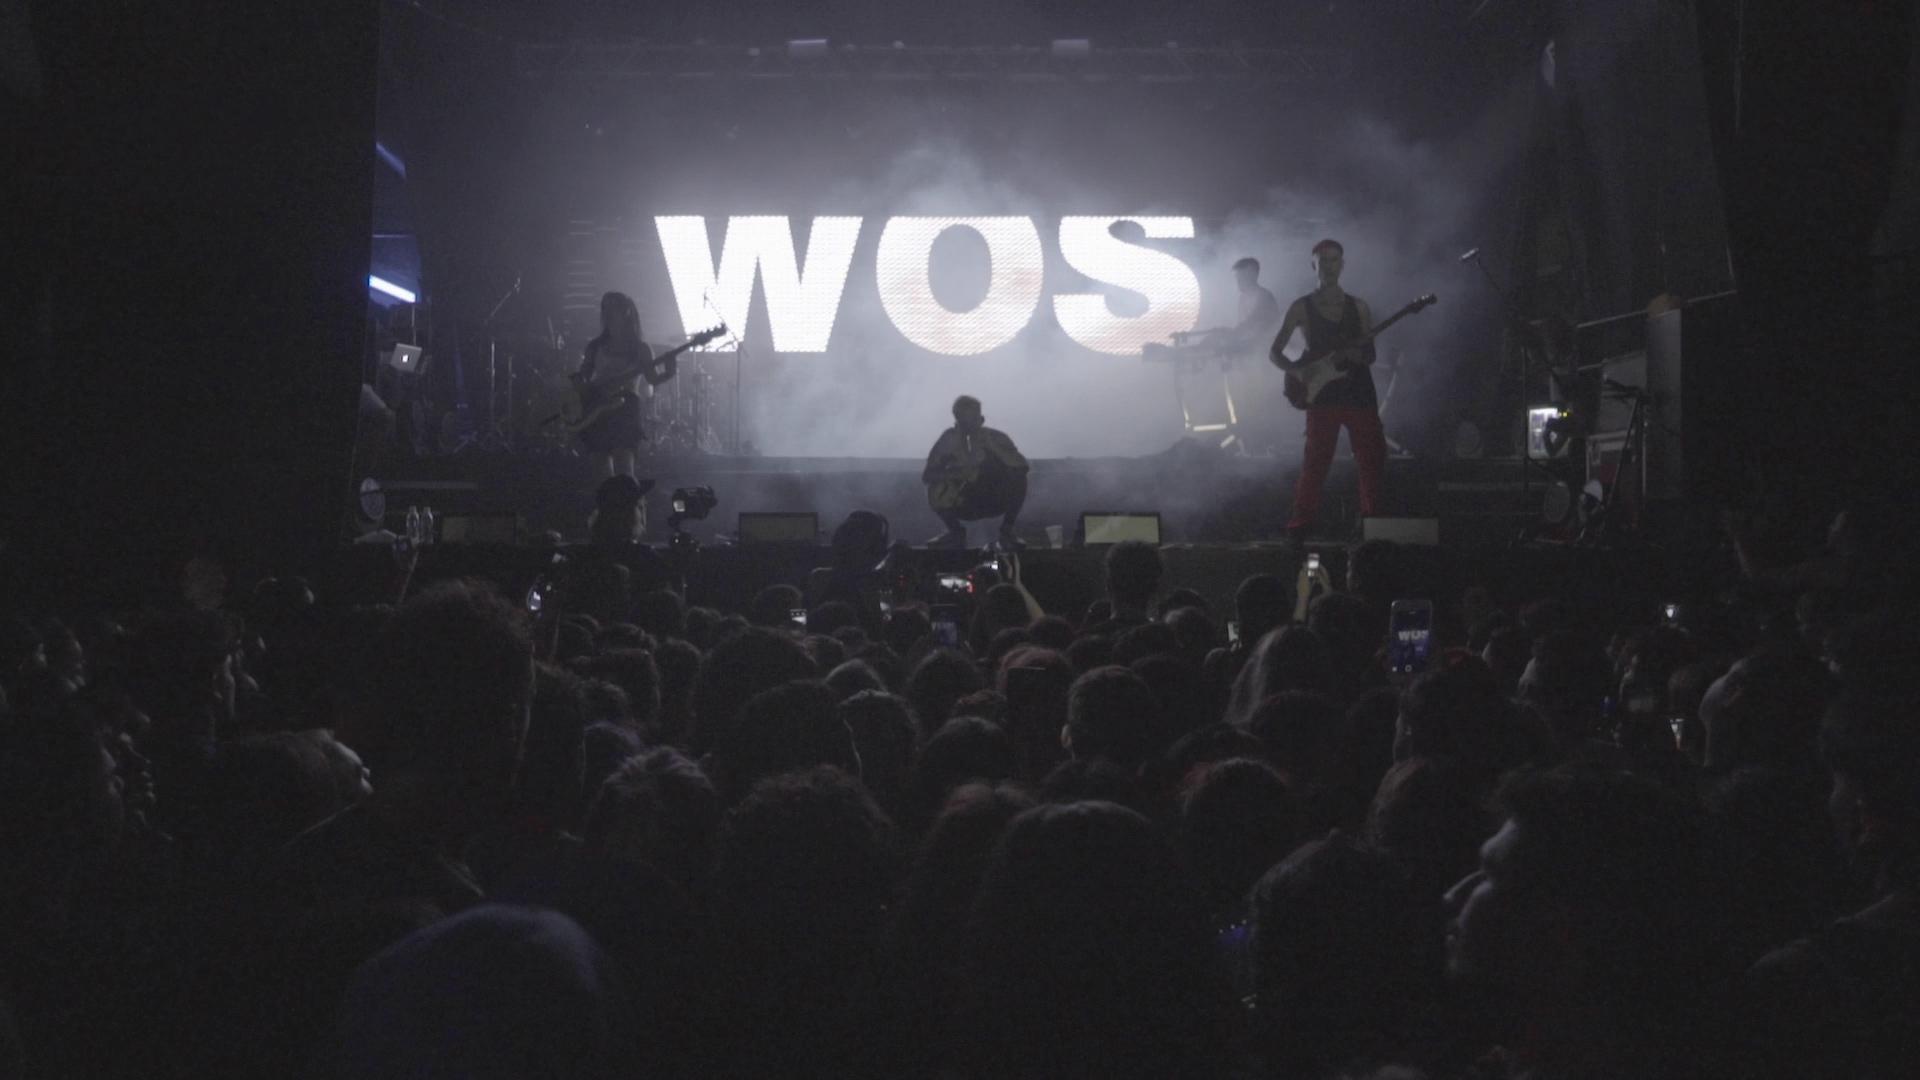 Wos_Groove_Caravana_loqueva (1)